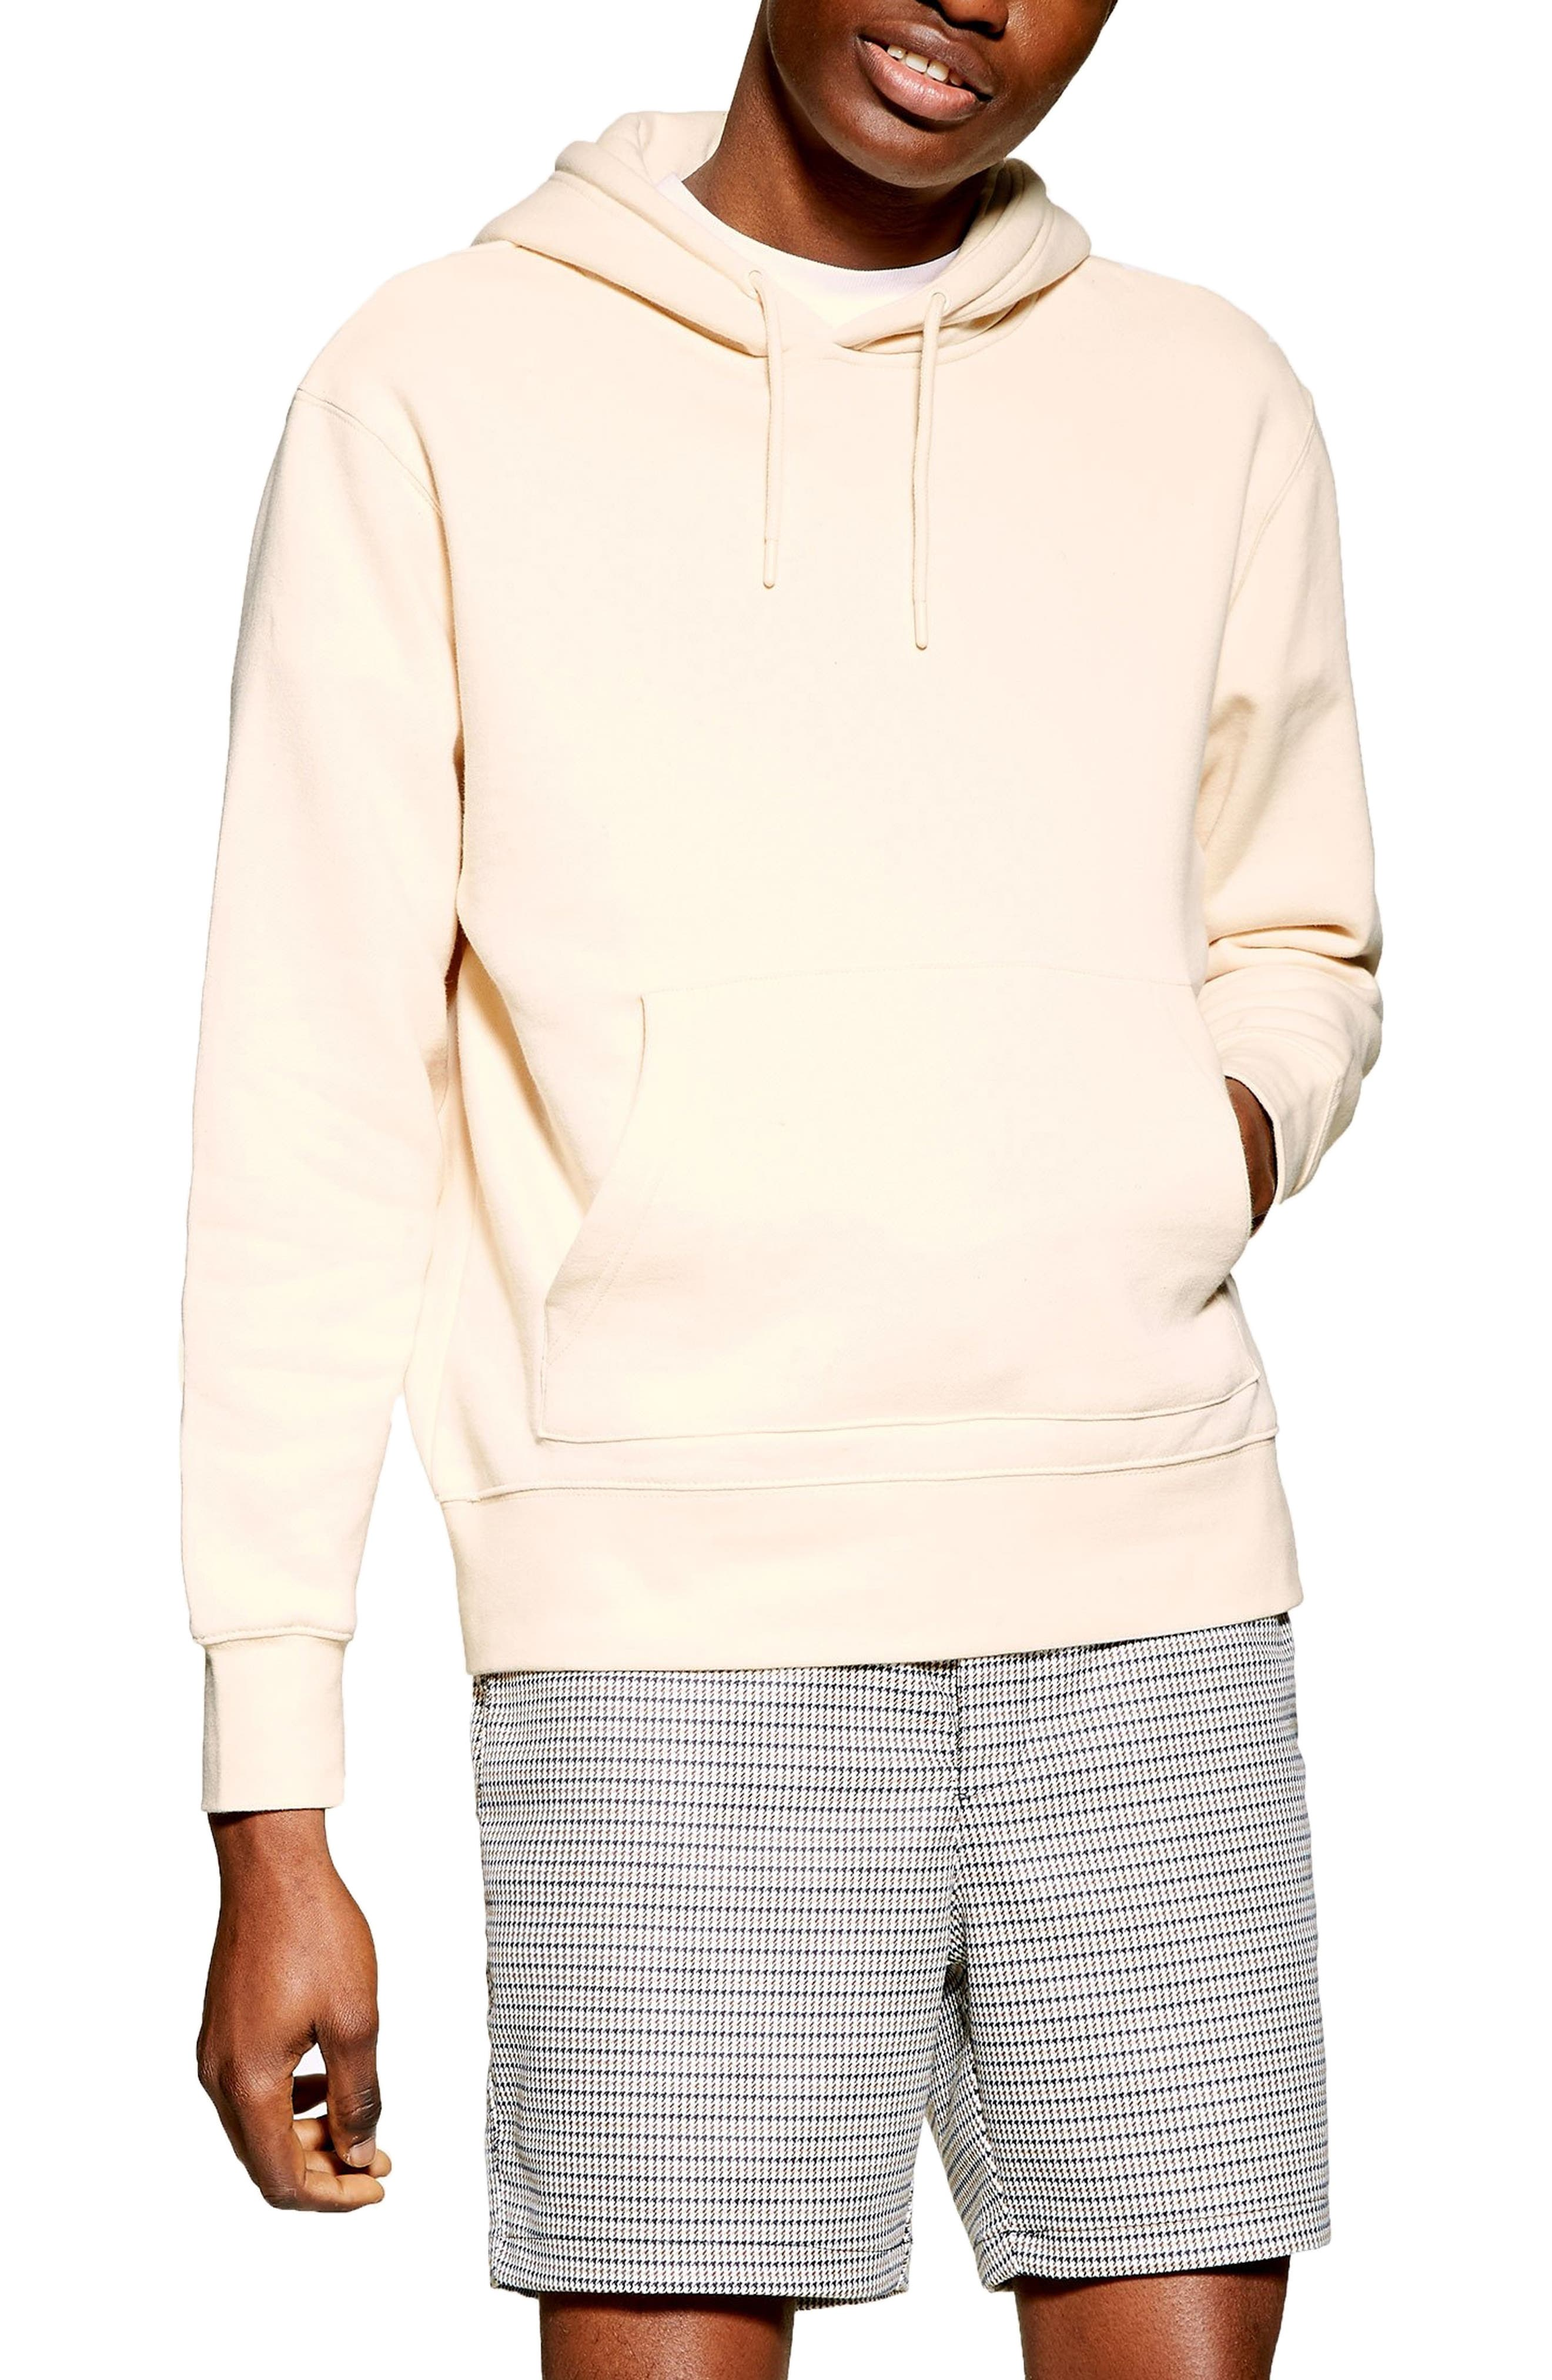 TOPMAN Tristan Hooded Sweatshirt, Main, color, STONE